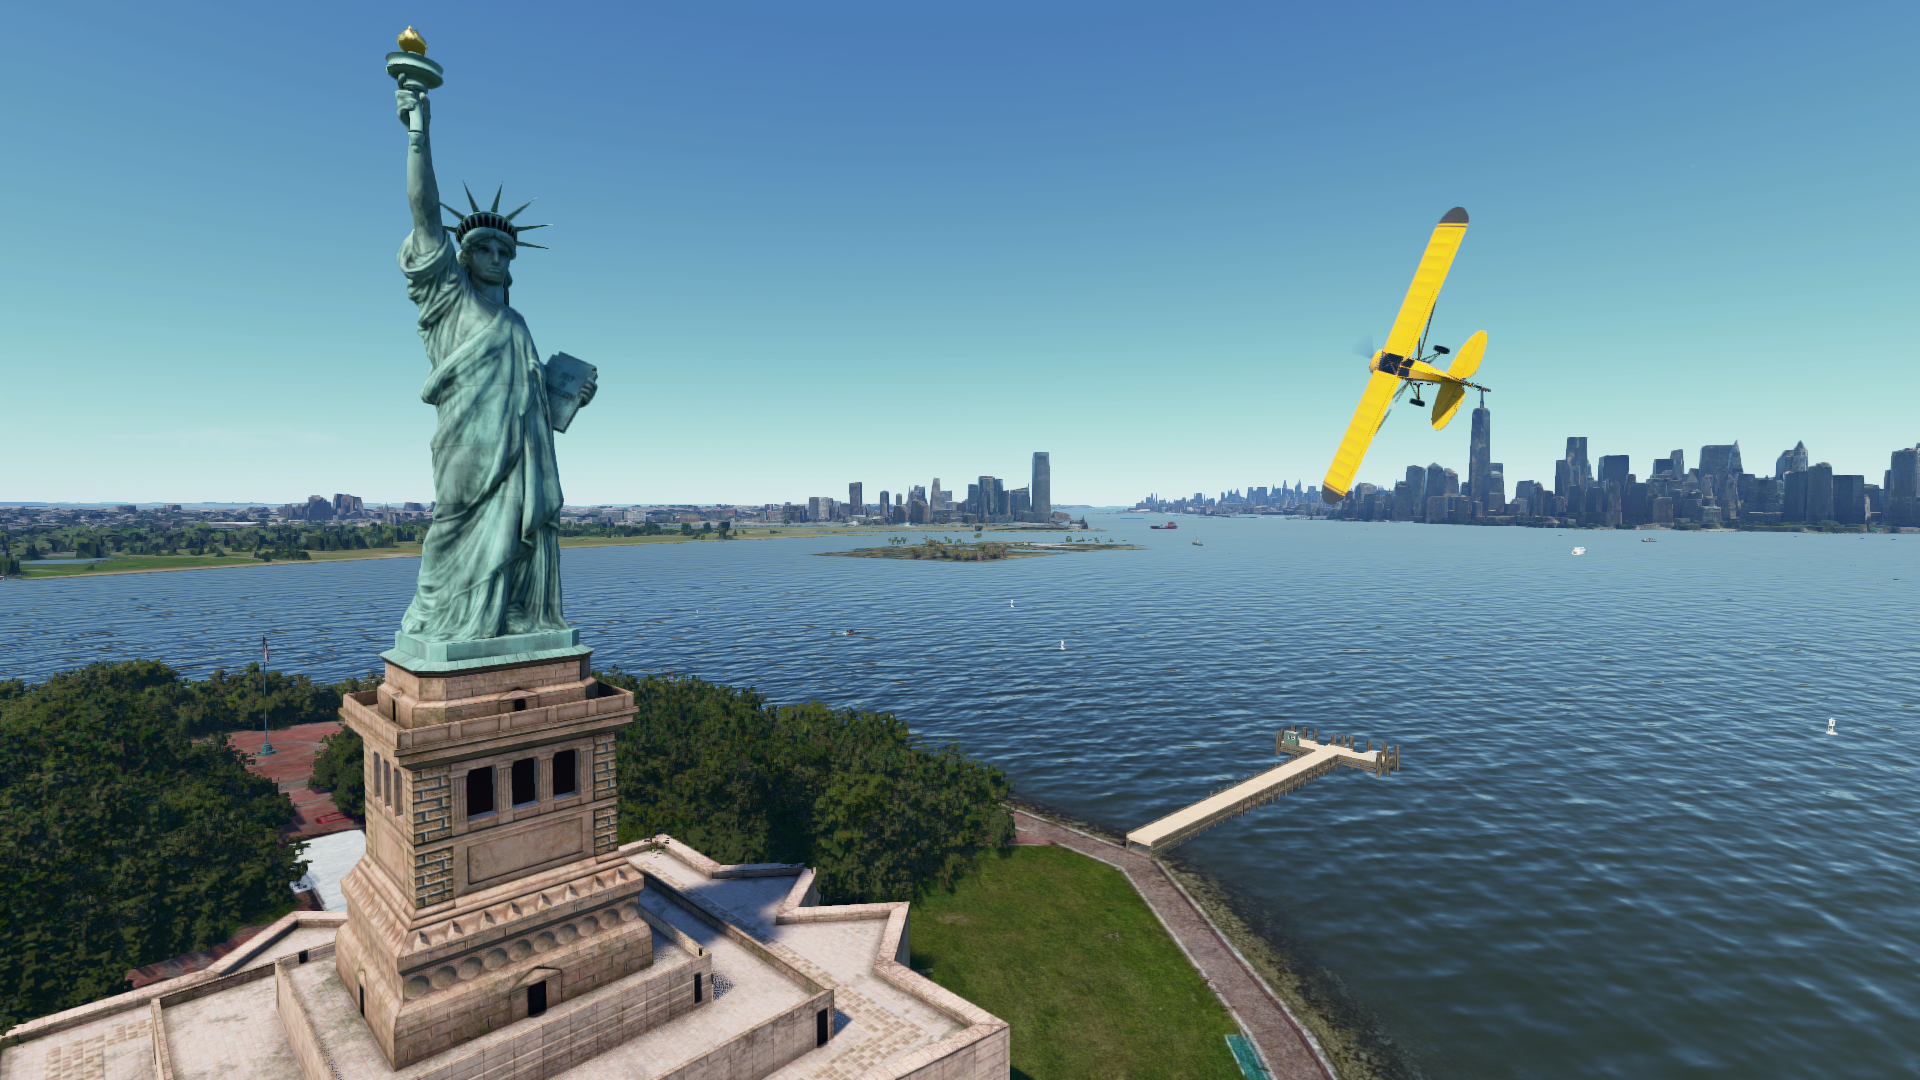 Microsoft Flight Simulator flight plans explained